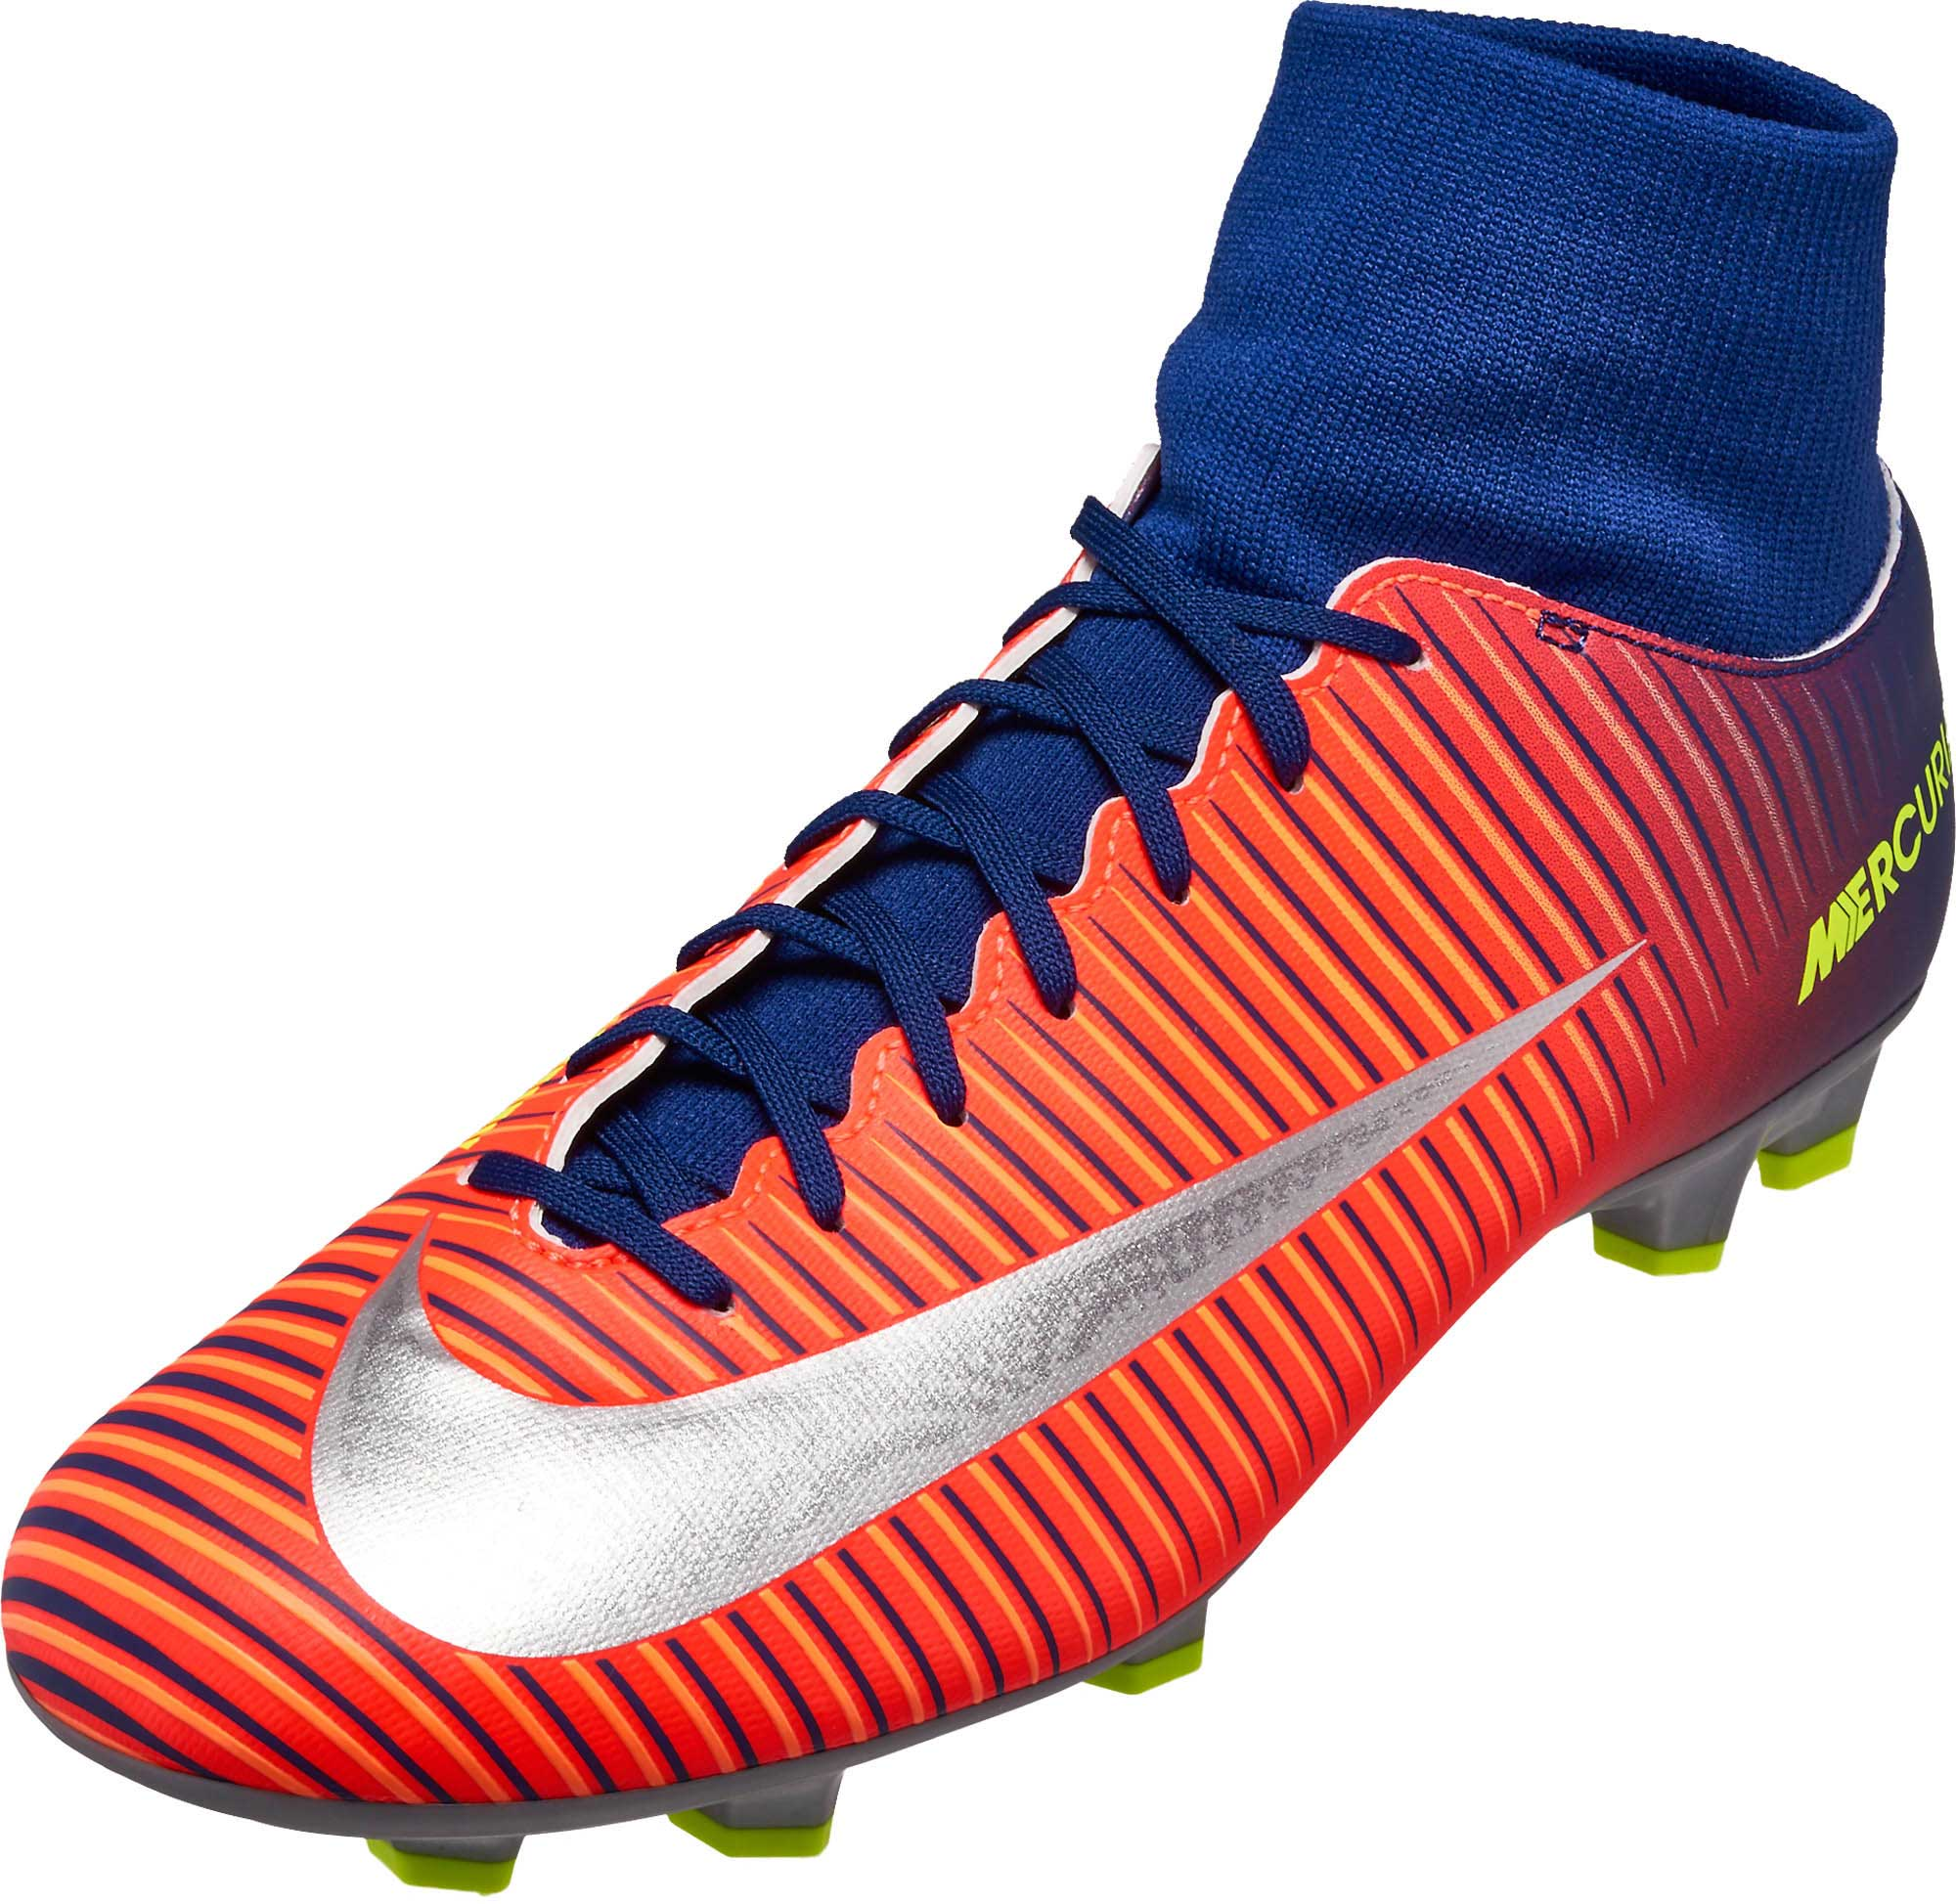 714a7d05c1c5 Nike Mercurial Victory VI DF - Blue & Chrome Mercurial Soccer Cleats